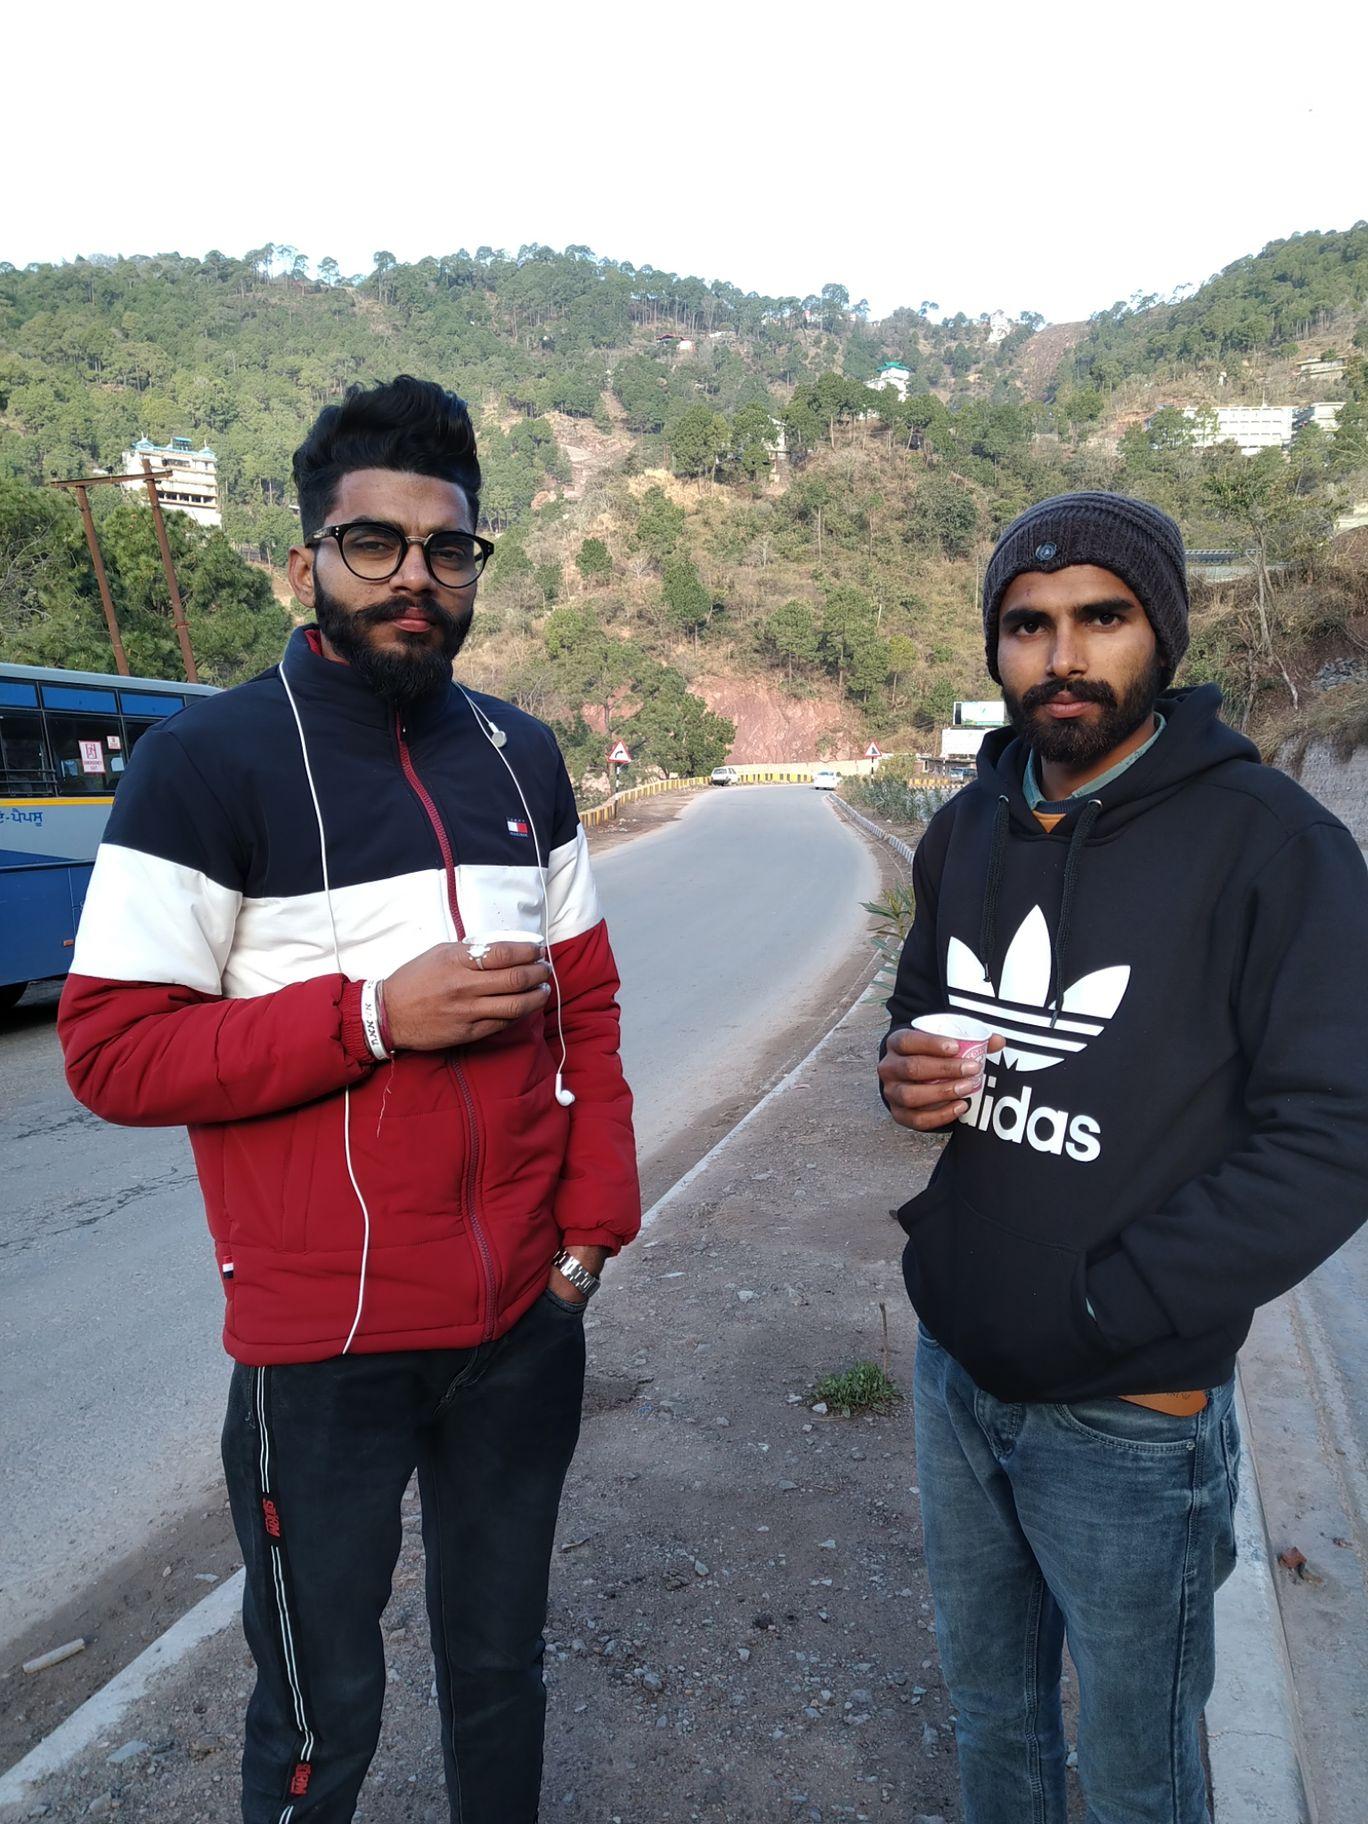 Photo of Shimla By Sandeep Lakht